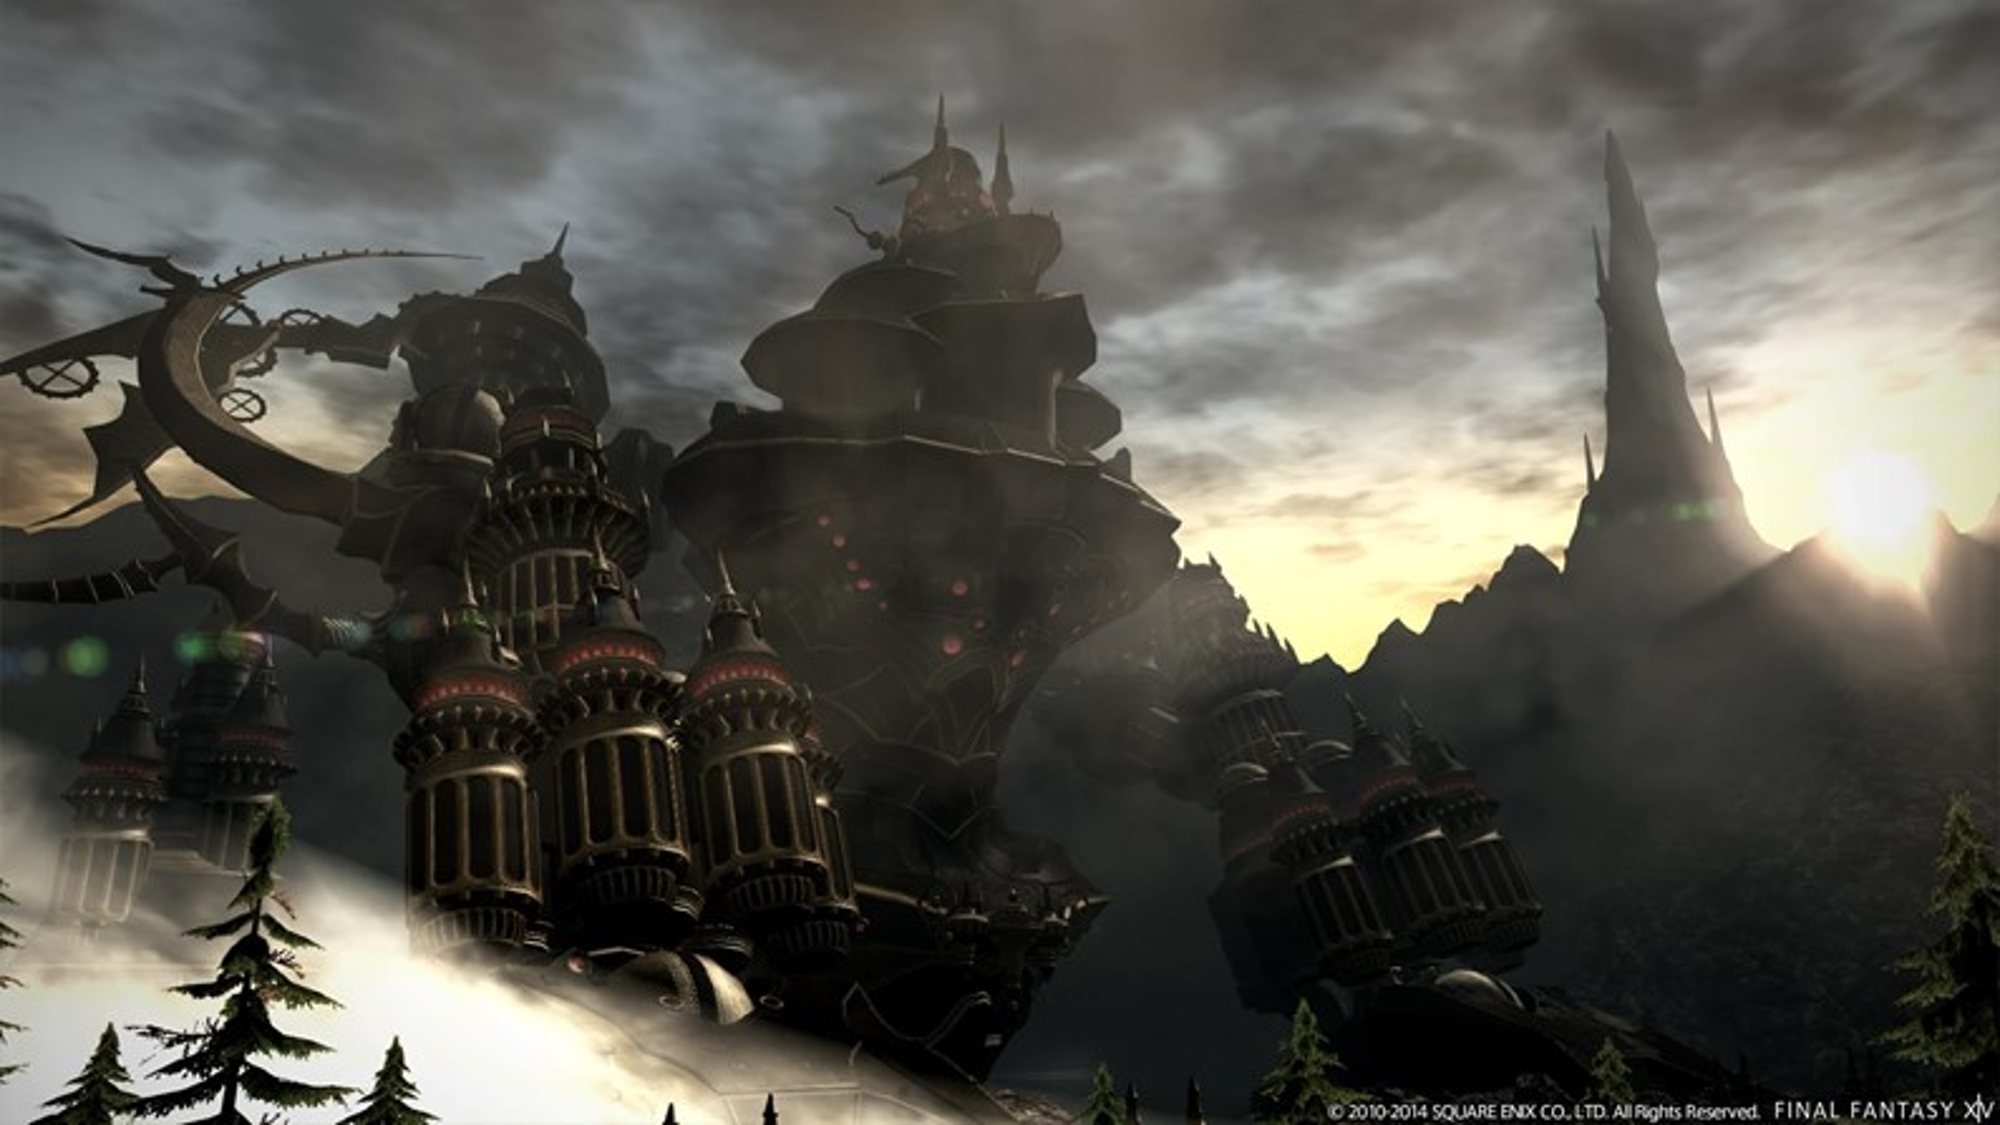 Confira a galeria de Final Fantasy XIV: Heavensward